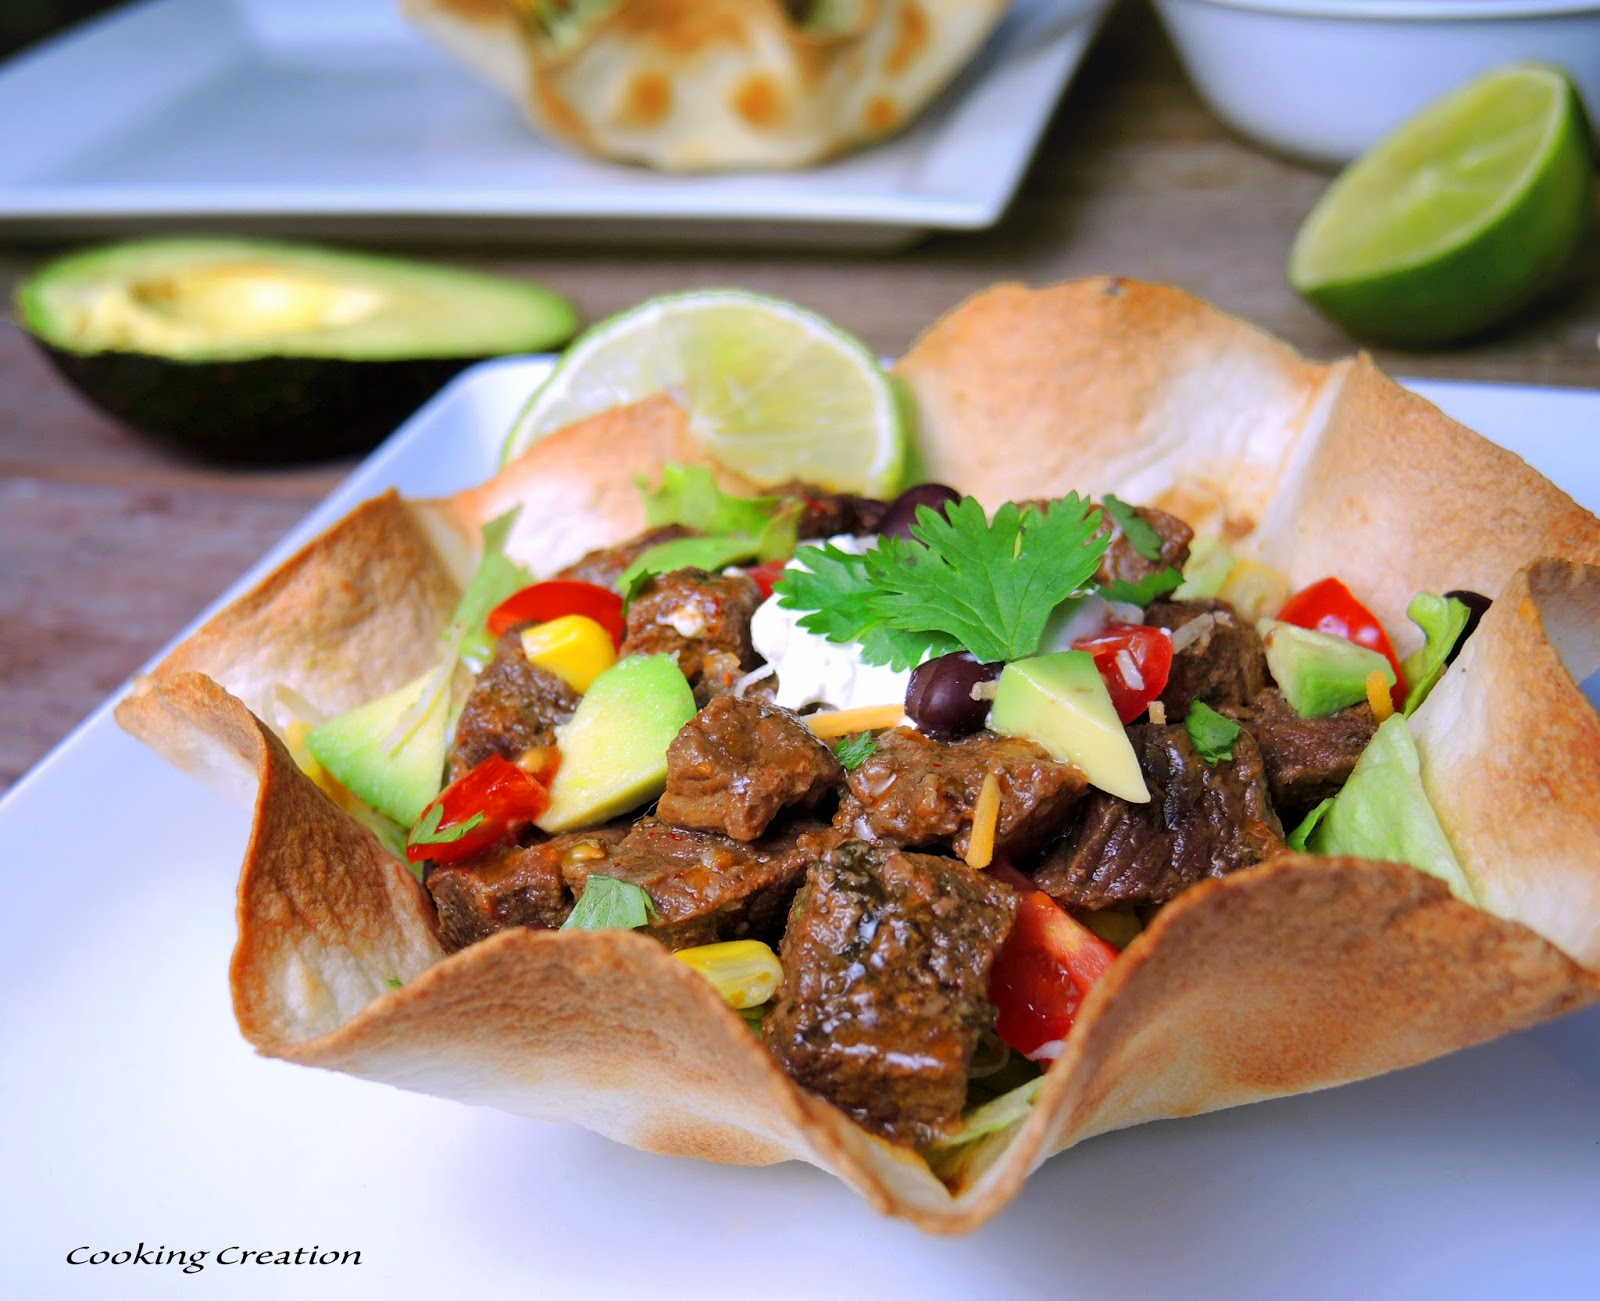 Cooking Creation: Crock Pot Chipotle Steak Taco Salad Bowls